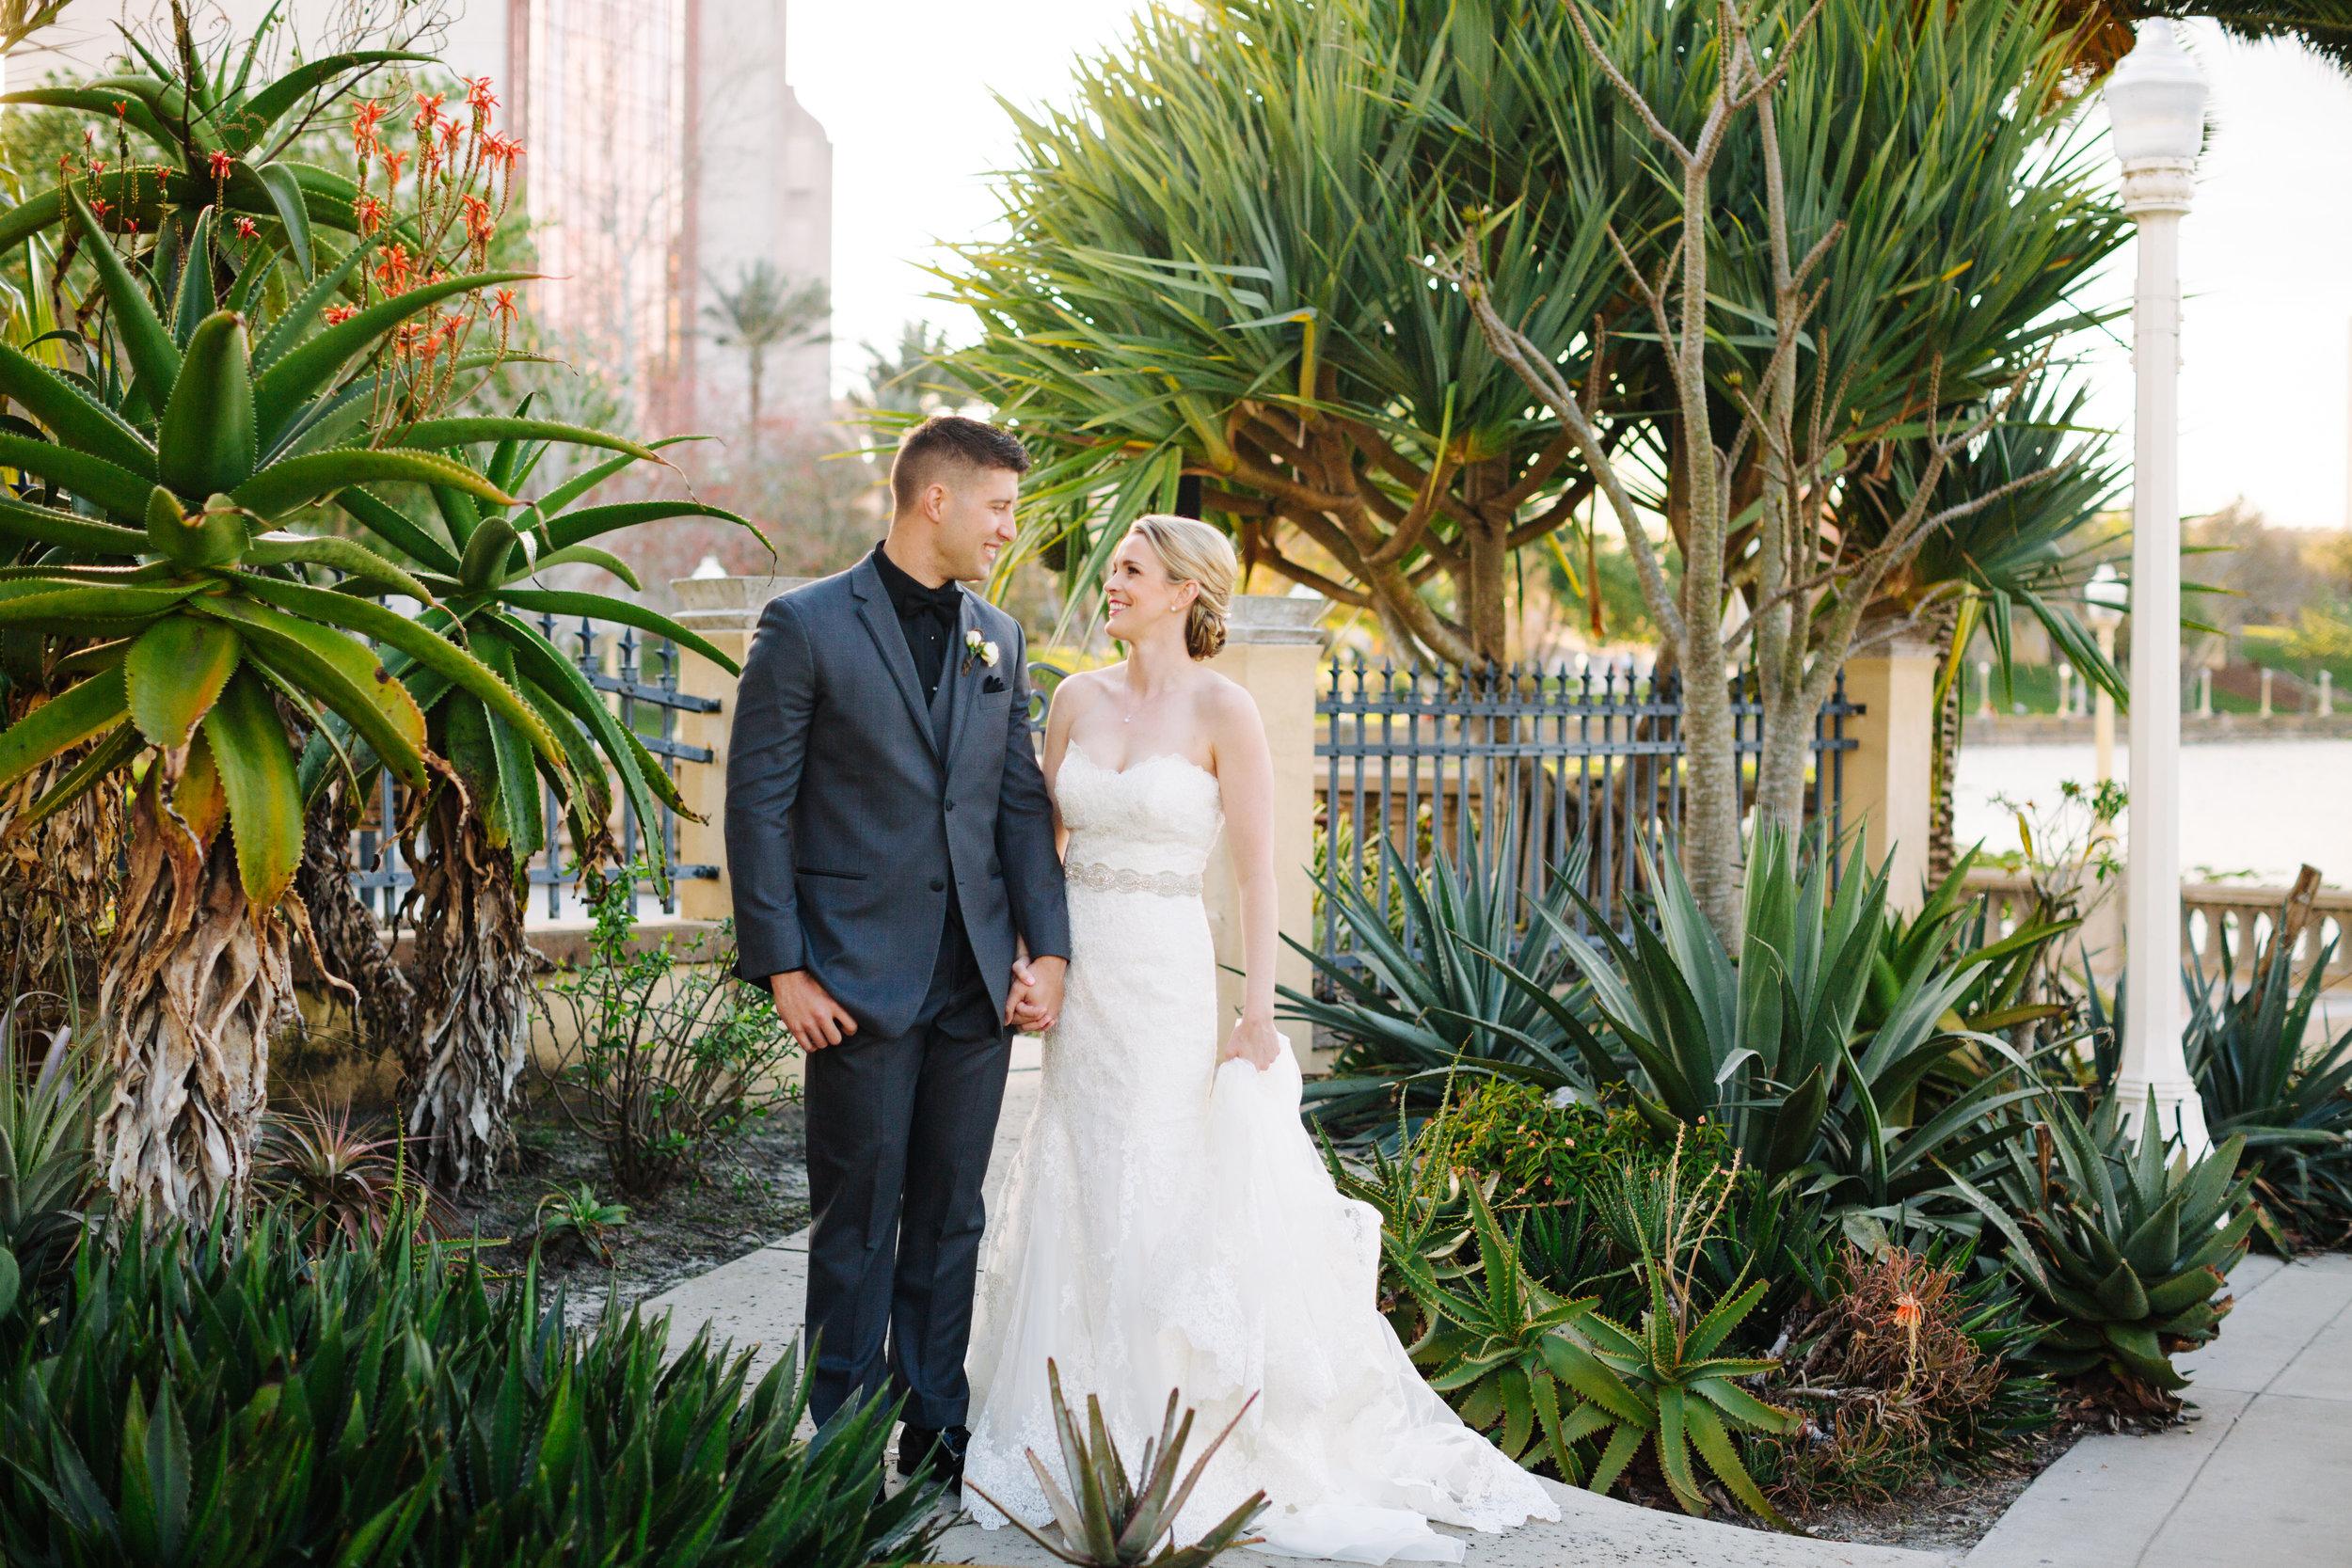 hollis gardens wedding downtown lakeland wedding jake and katie photography-28.jpg